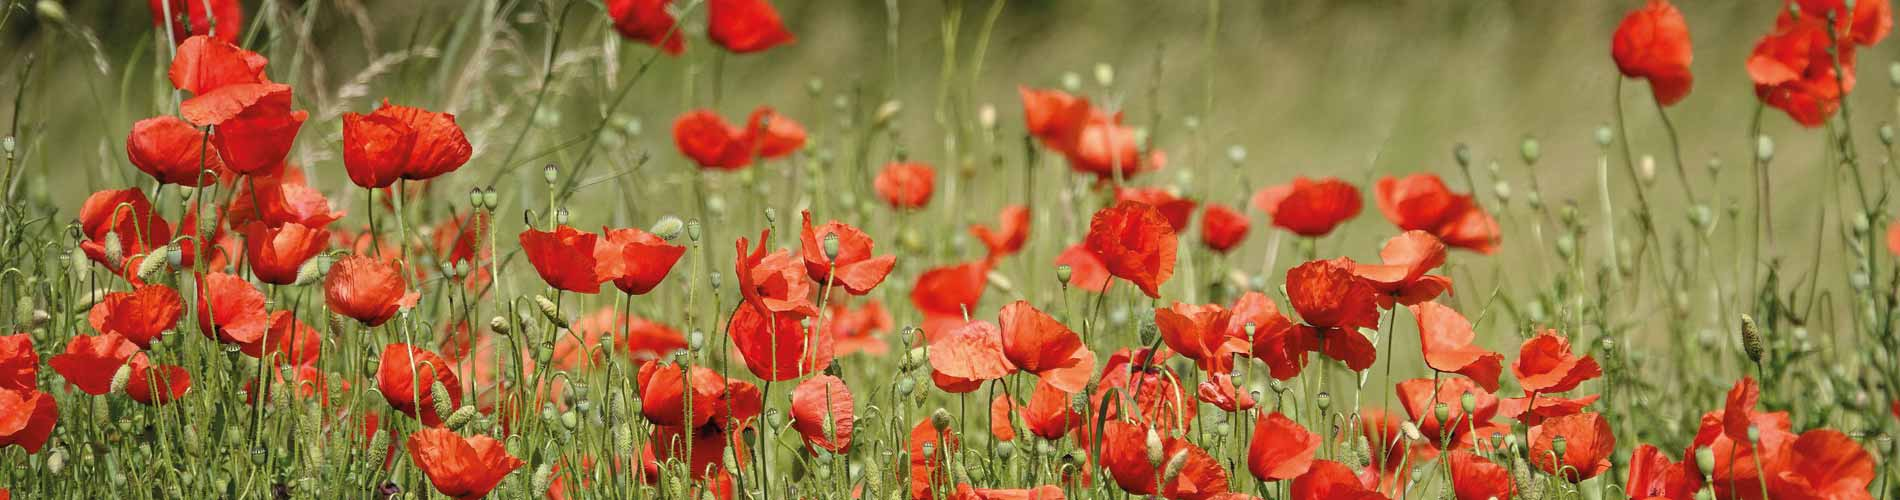 Blog_SpringFlowers_Poppies_1900x500_Q120